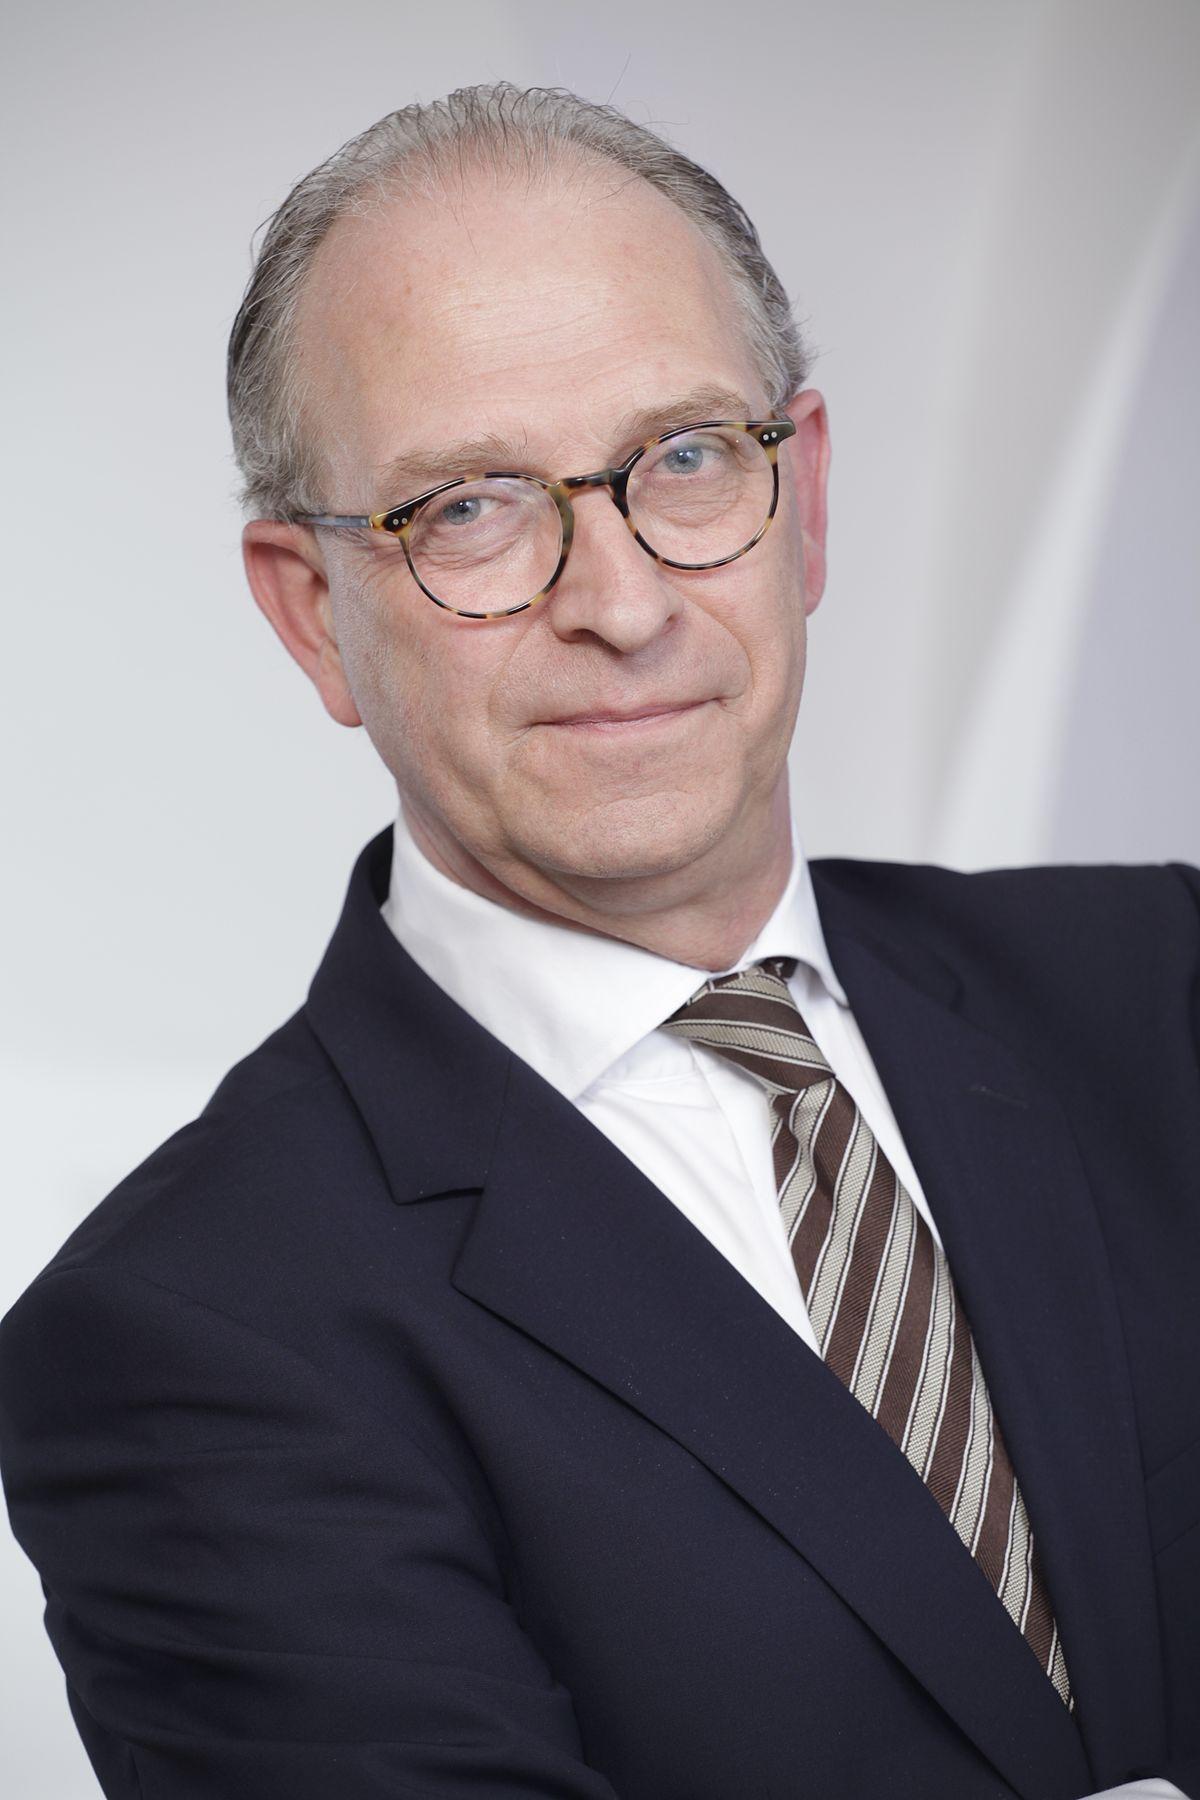 BIOGRAFIE Roland Kaiser